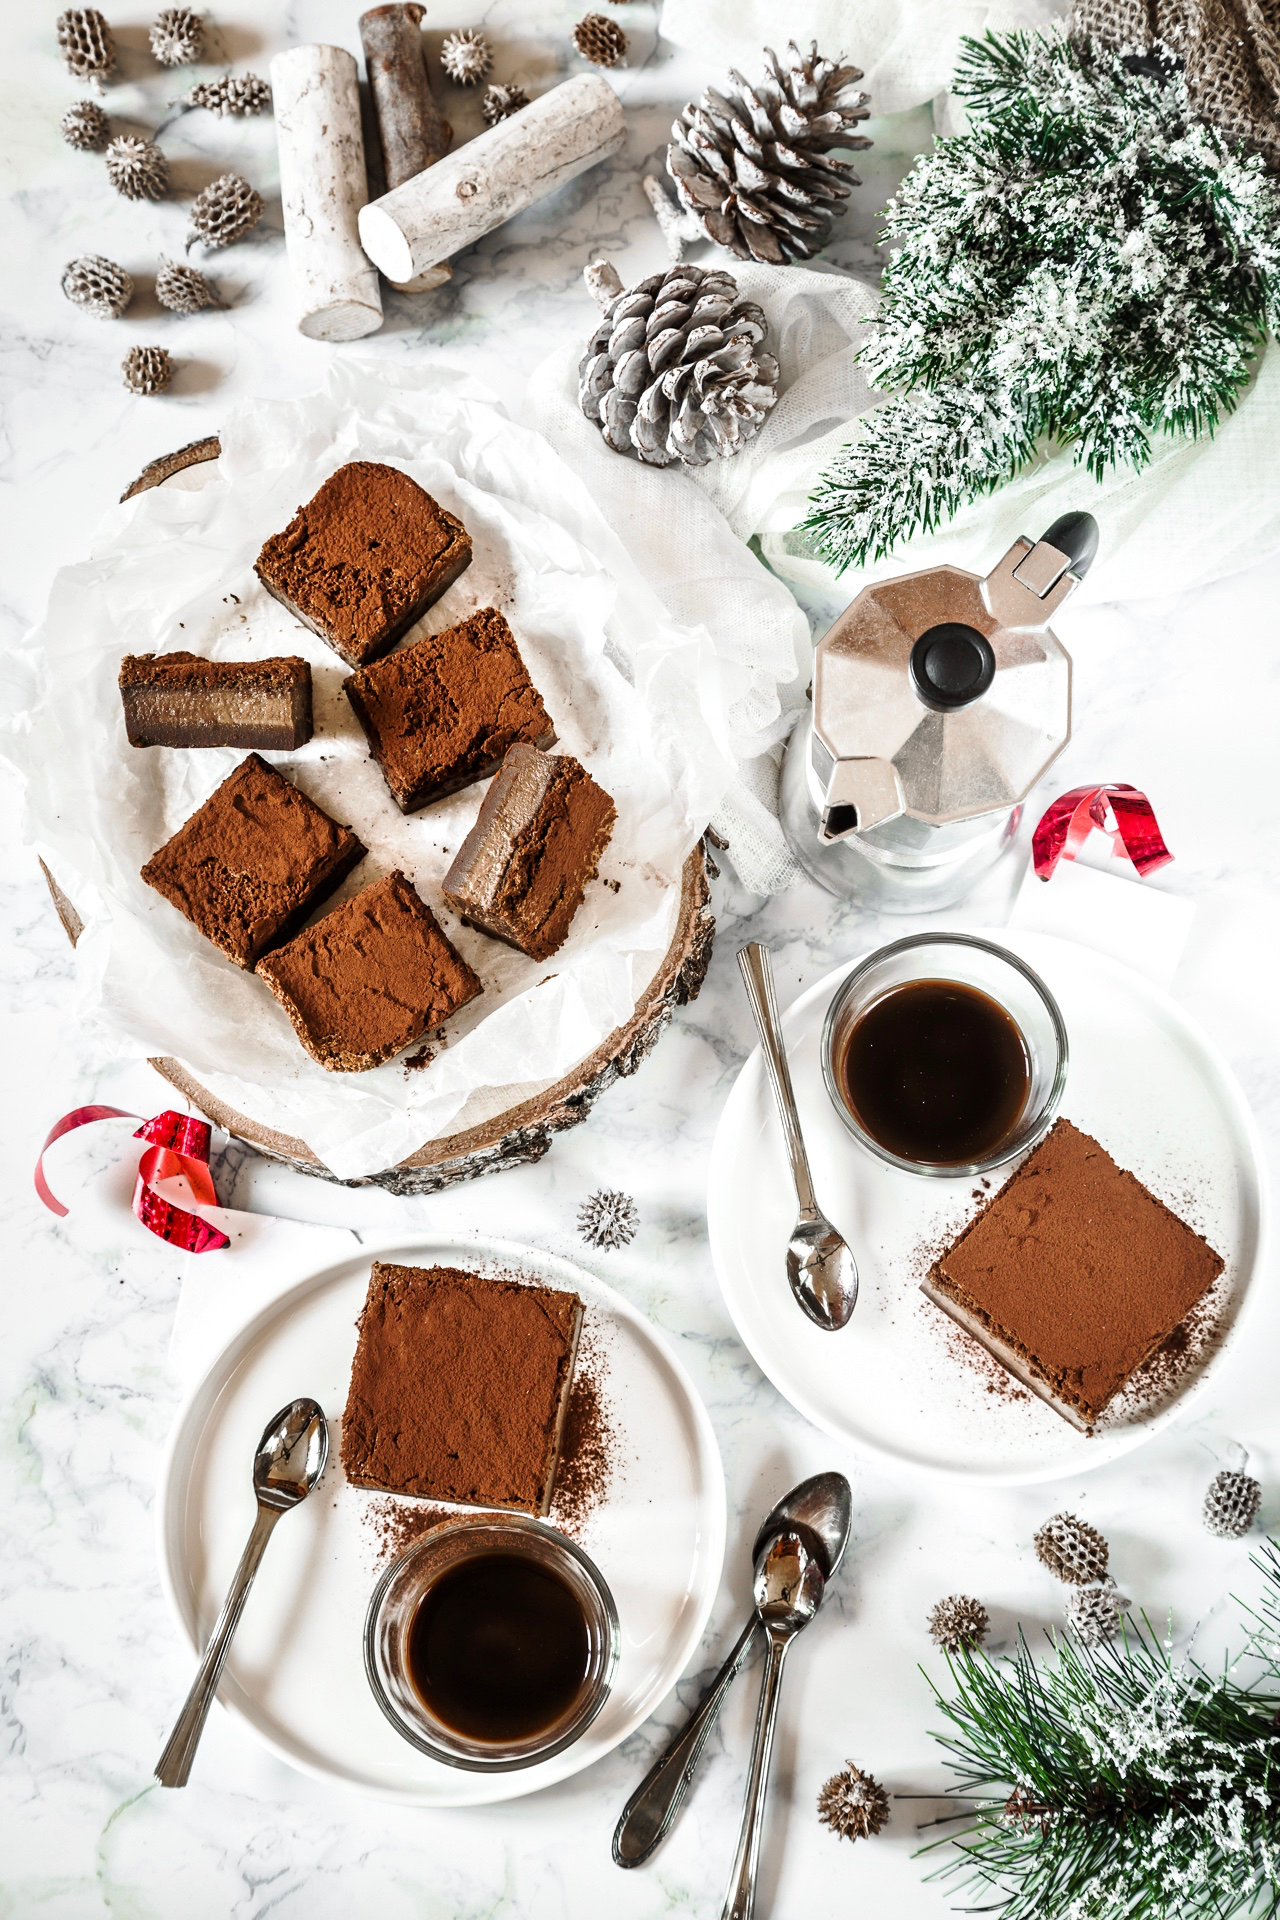 torta magica al caffè e cardamomo - torta magica al caffè - coffee magic cake recipe - coffee and chocolate magic cake recipe - dessert recipe